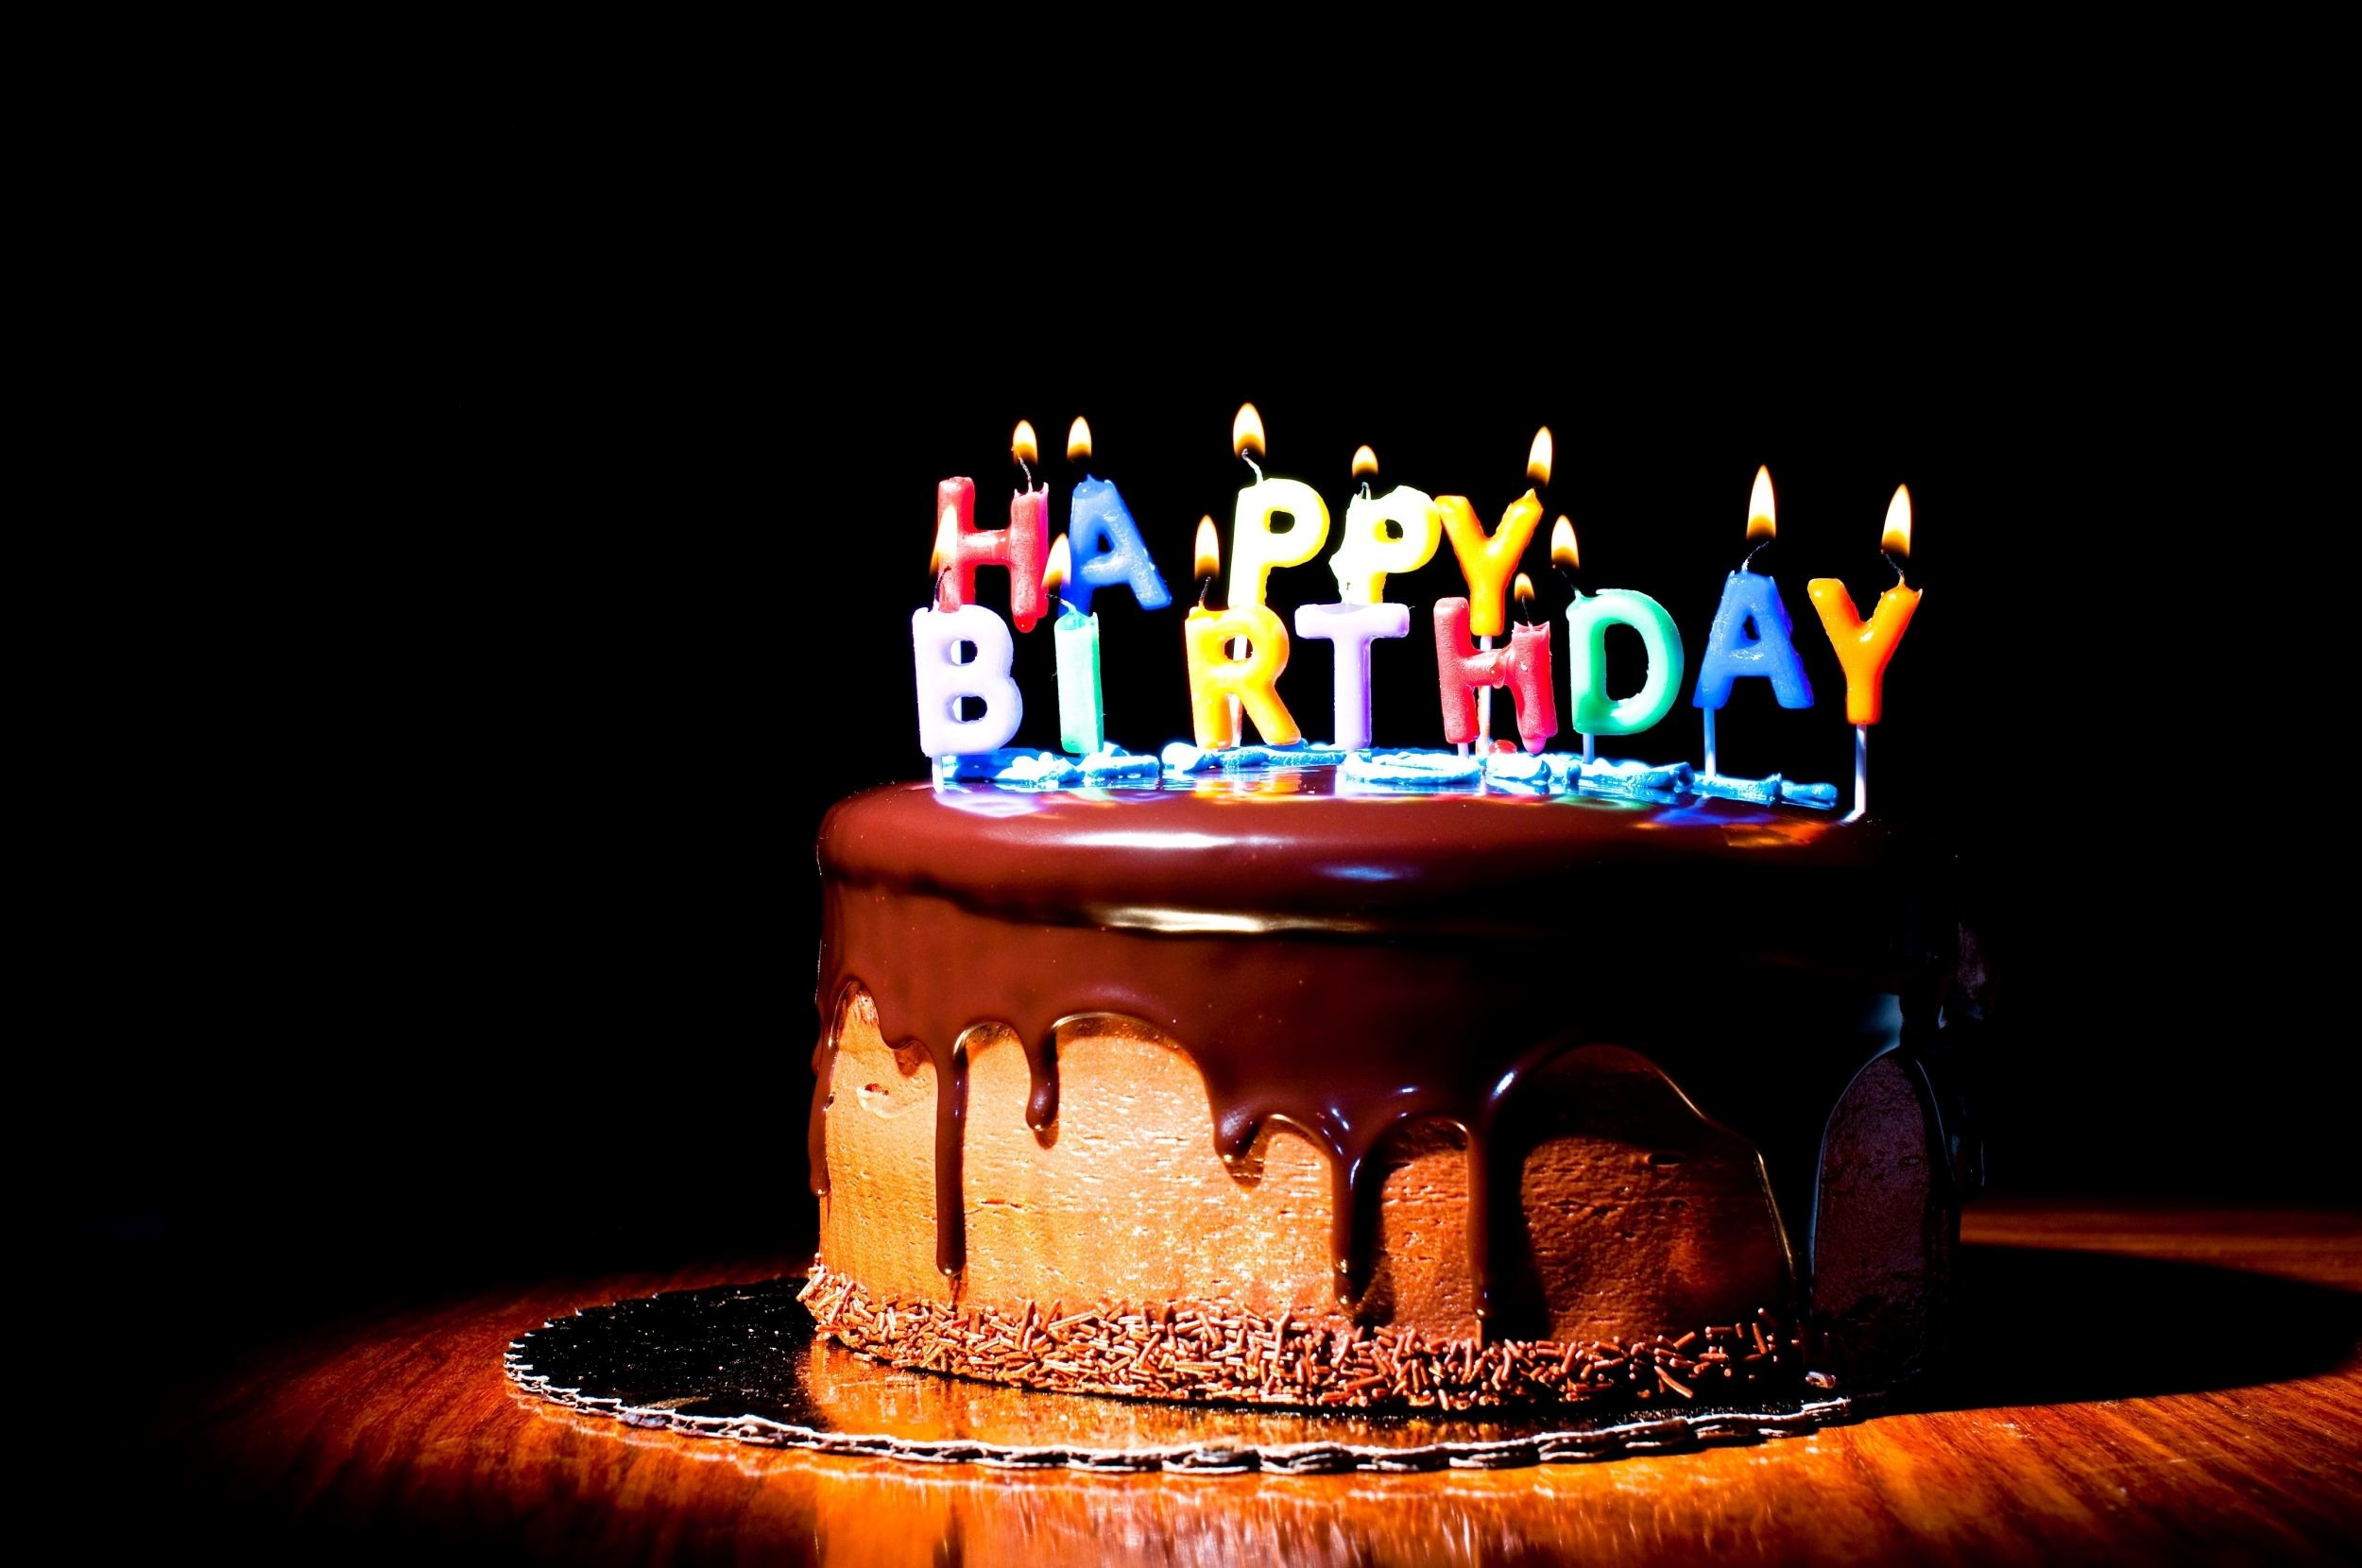 Happy Birthday Cake Wallpapers Hd IFC Radio